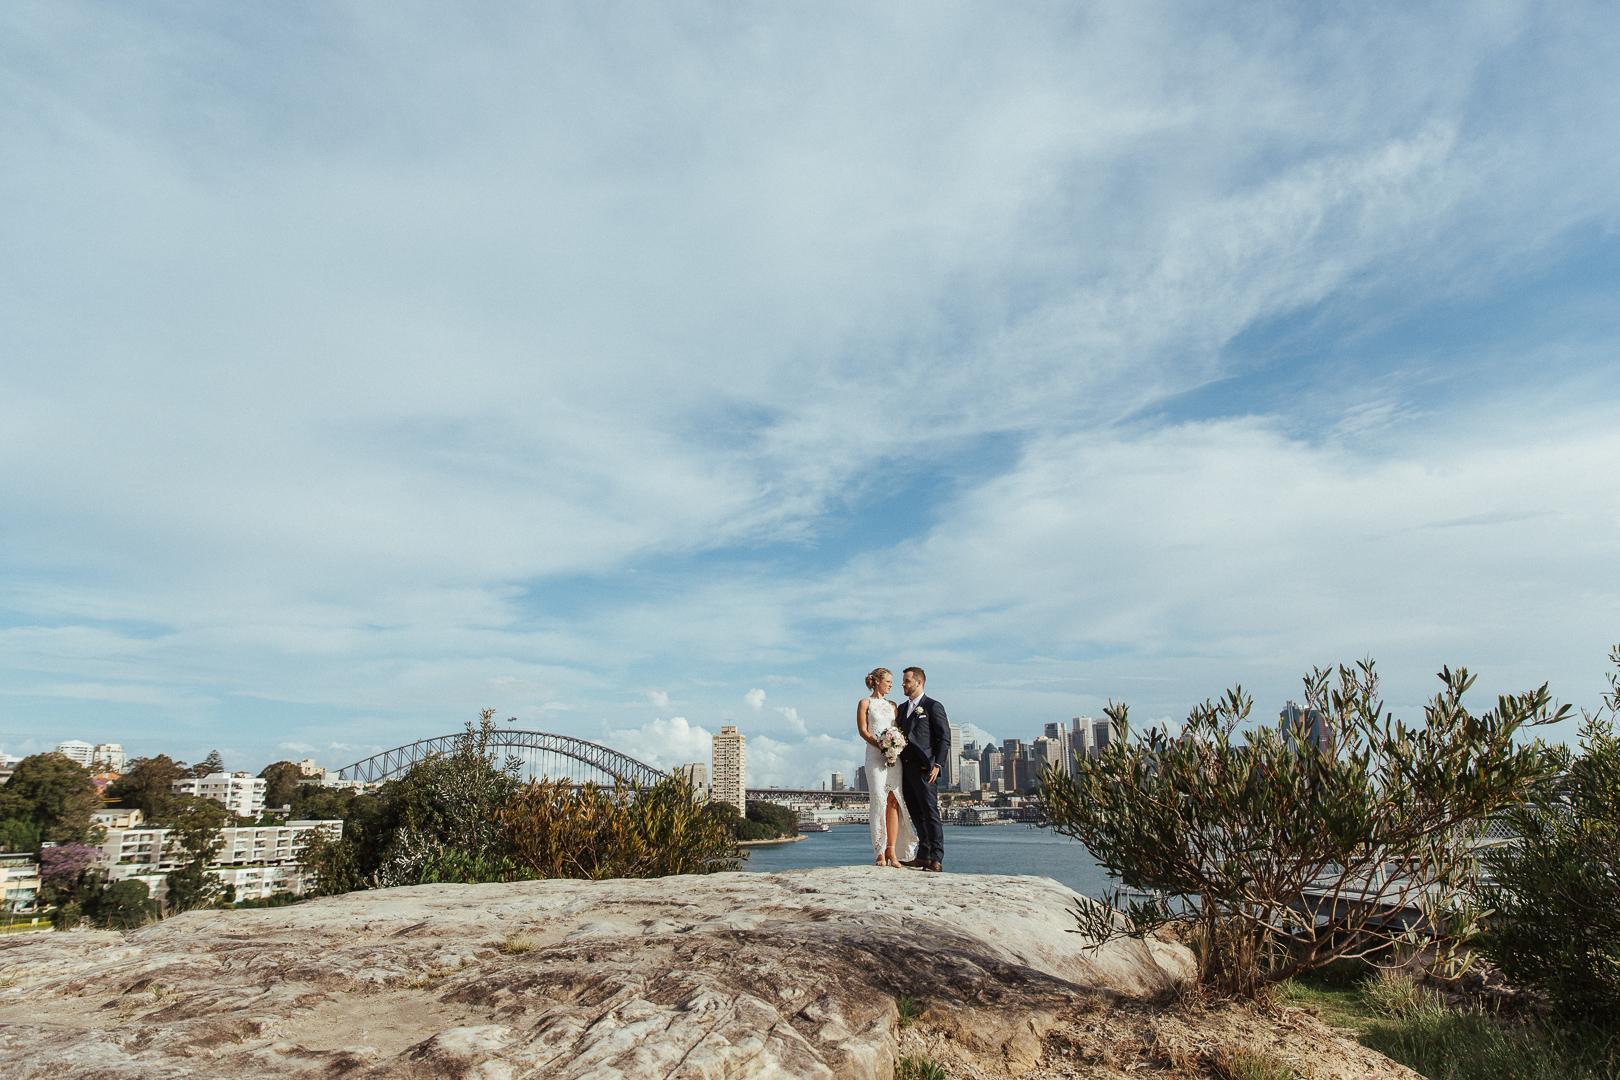 Rose_Photos_Zest_Wedding_Photography_001.jpg